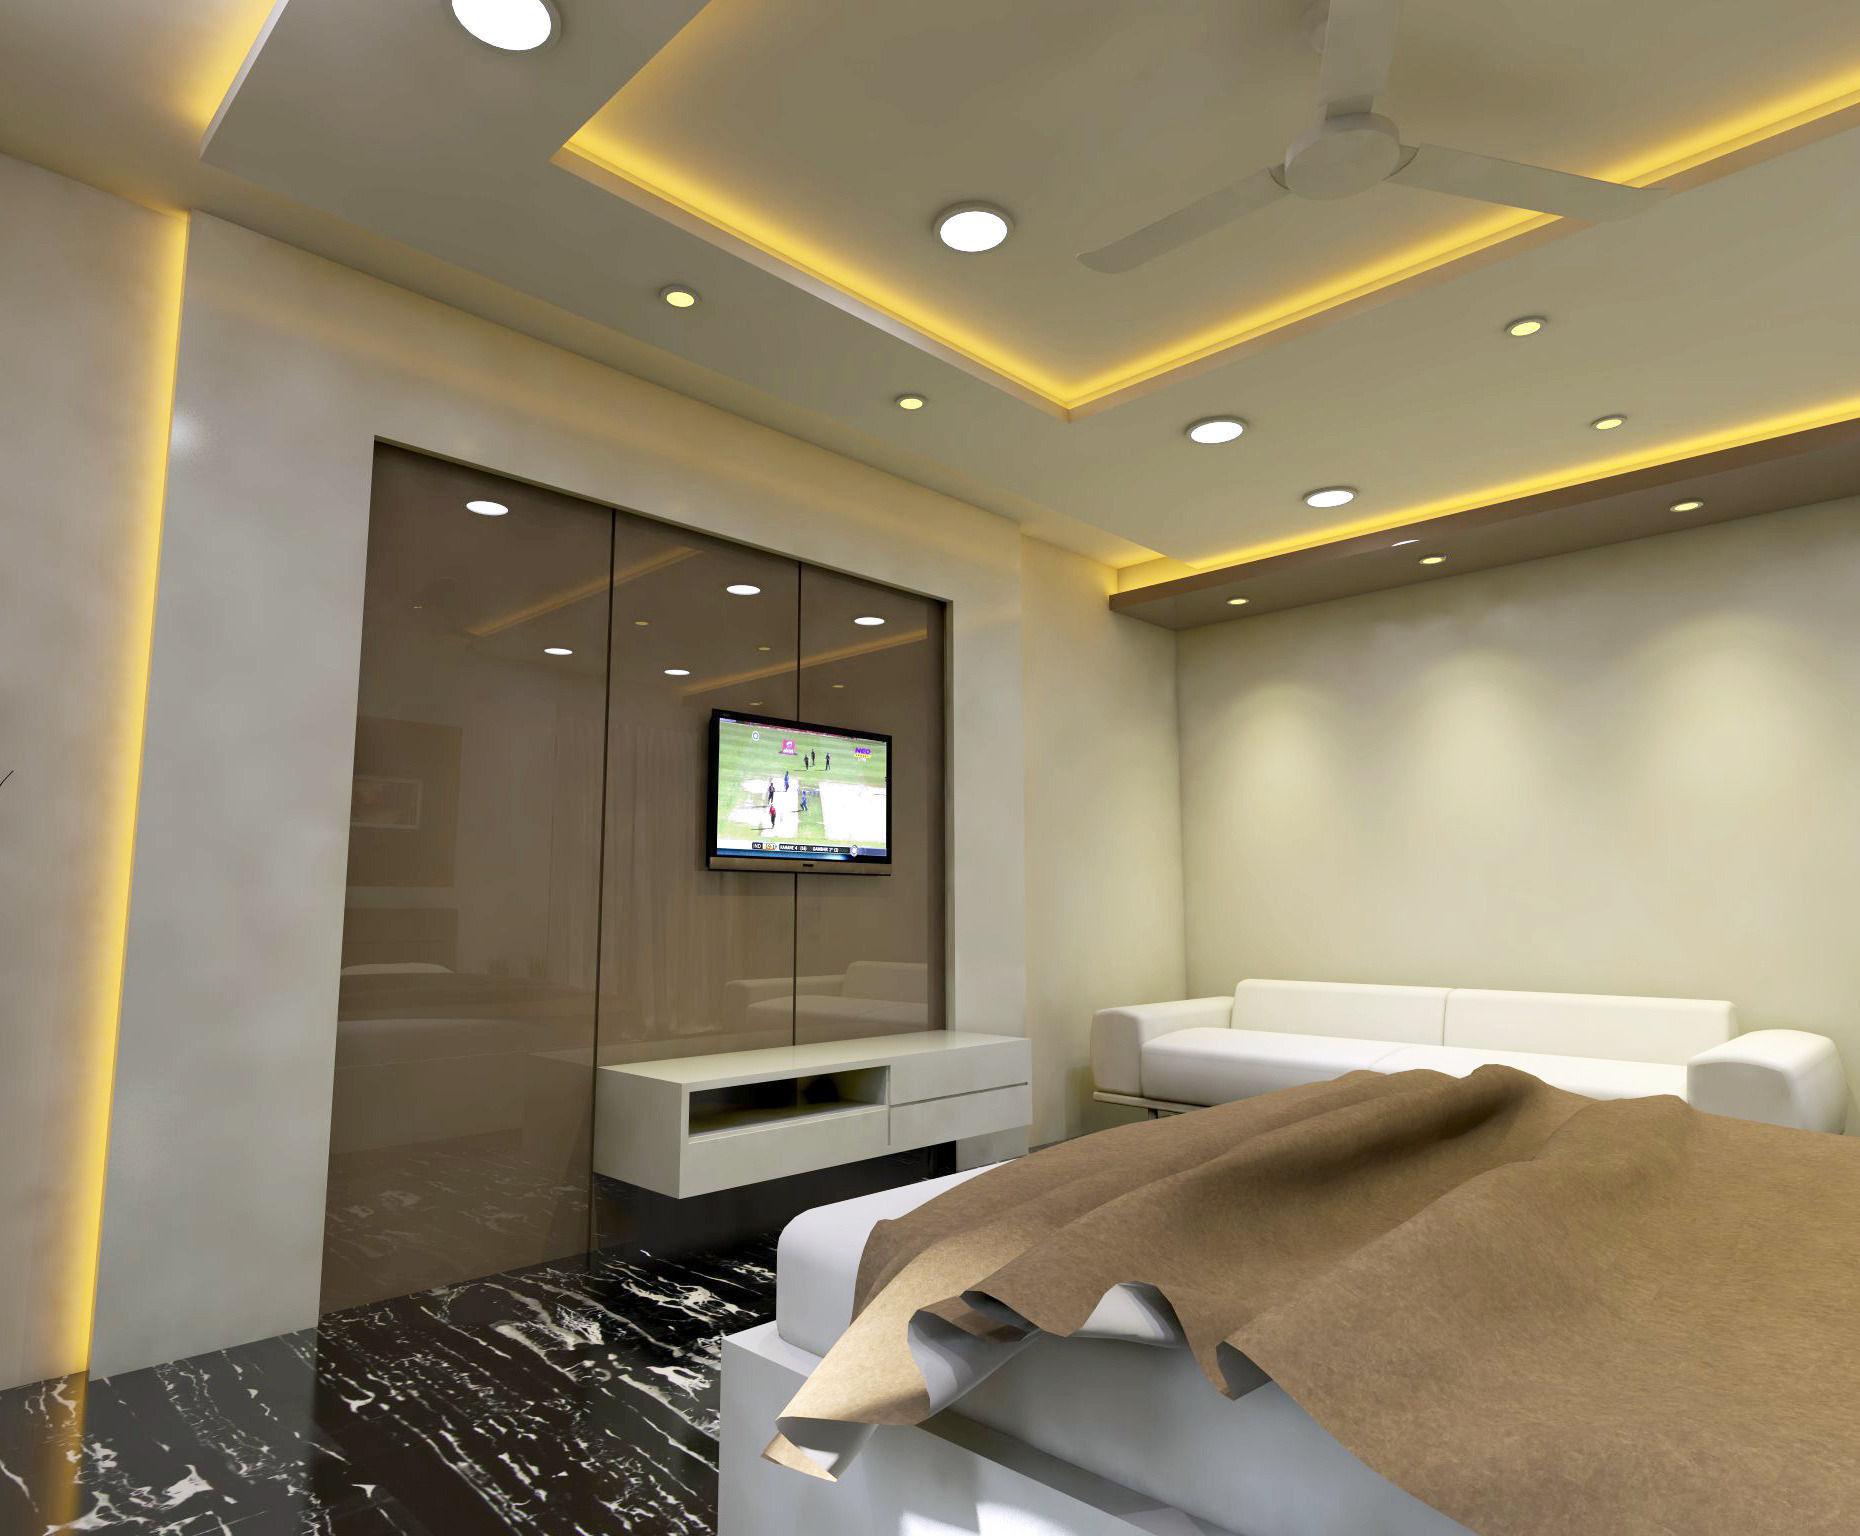 Modern Bedroom Interior Vray Rendered 3D model | CGTrader